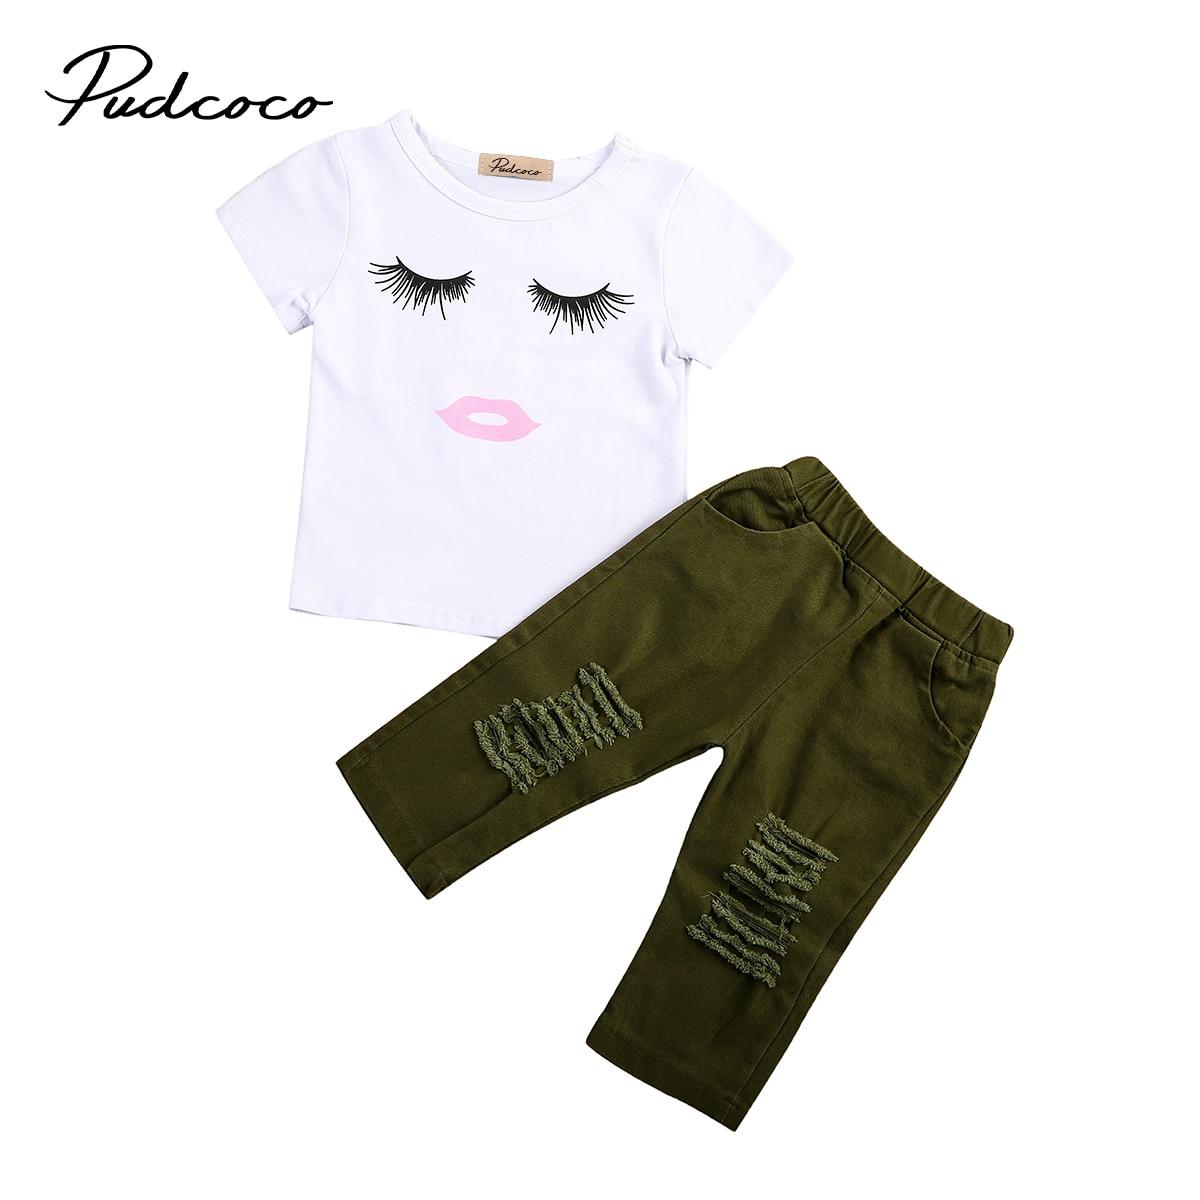 Toddler Baby Girls Eyelash Tops T Shirt Hole Long Pants Outfits Clothes Set Children Clothing Clothes For Girls Clothes For Clothes For Girlsclothes Set Aliexpress